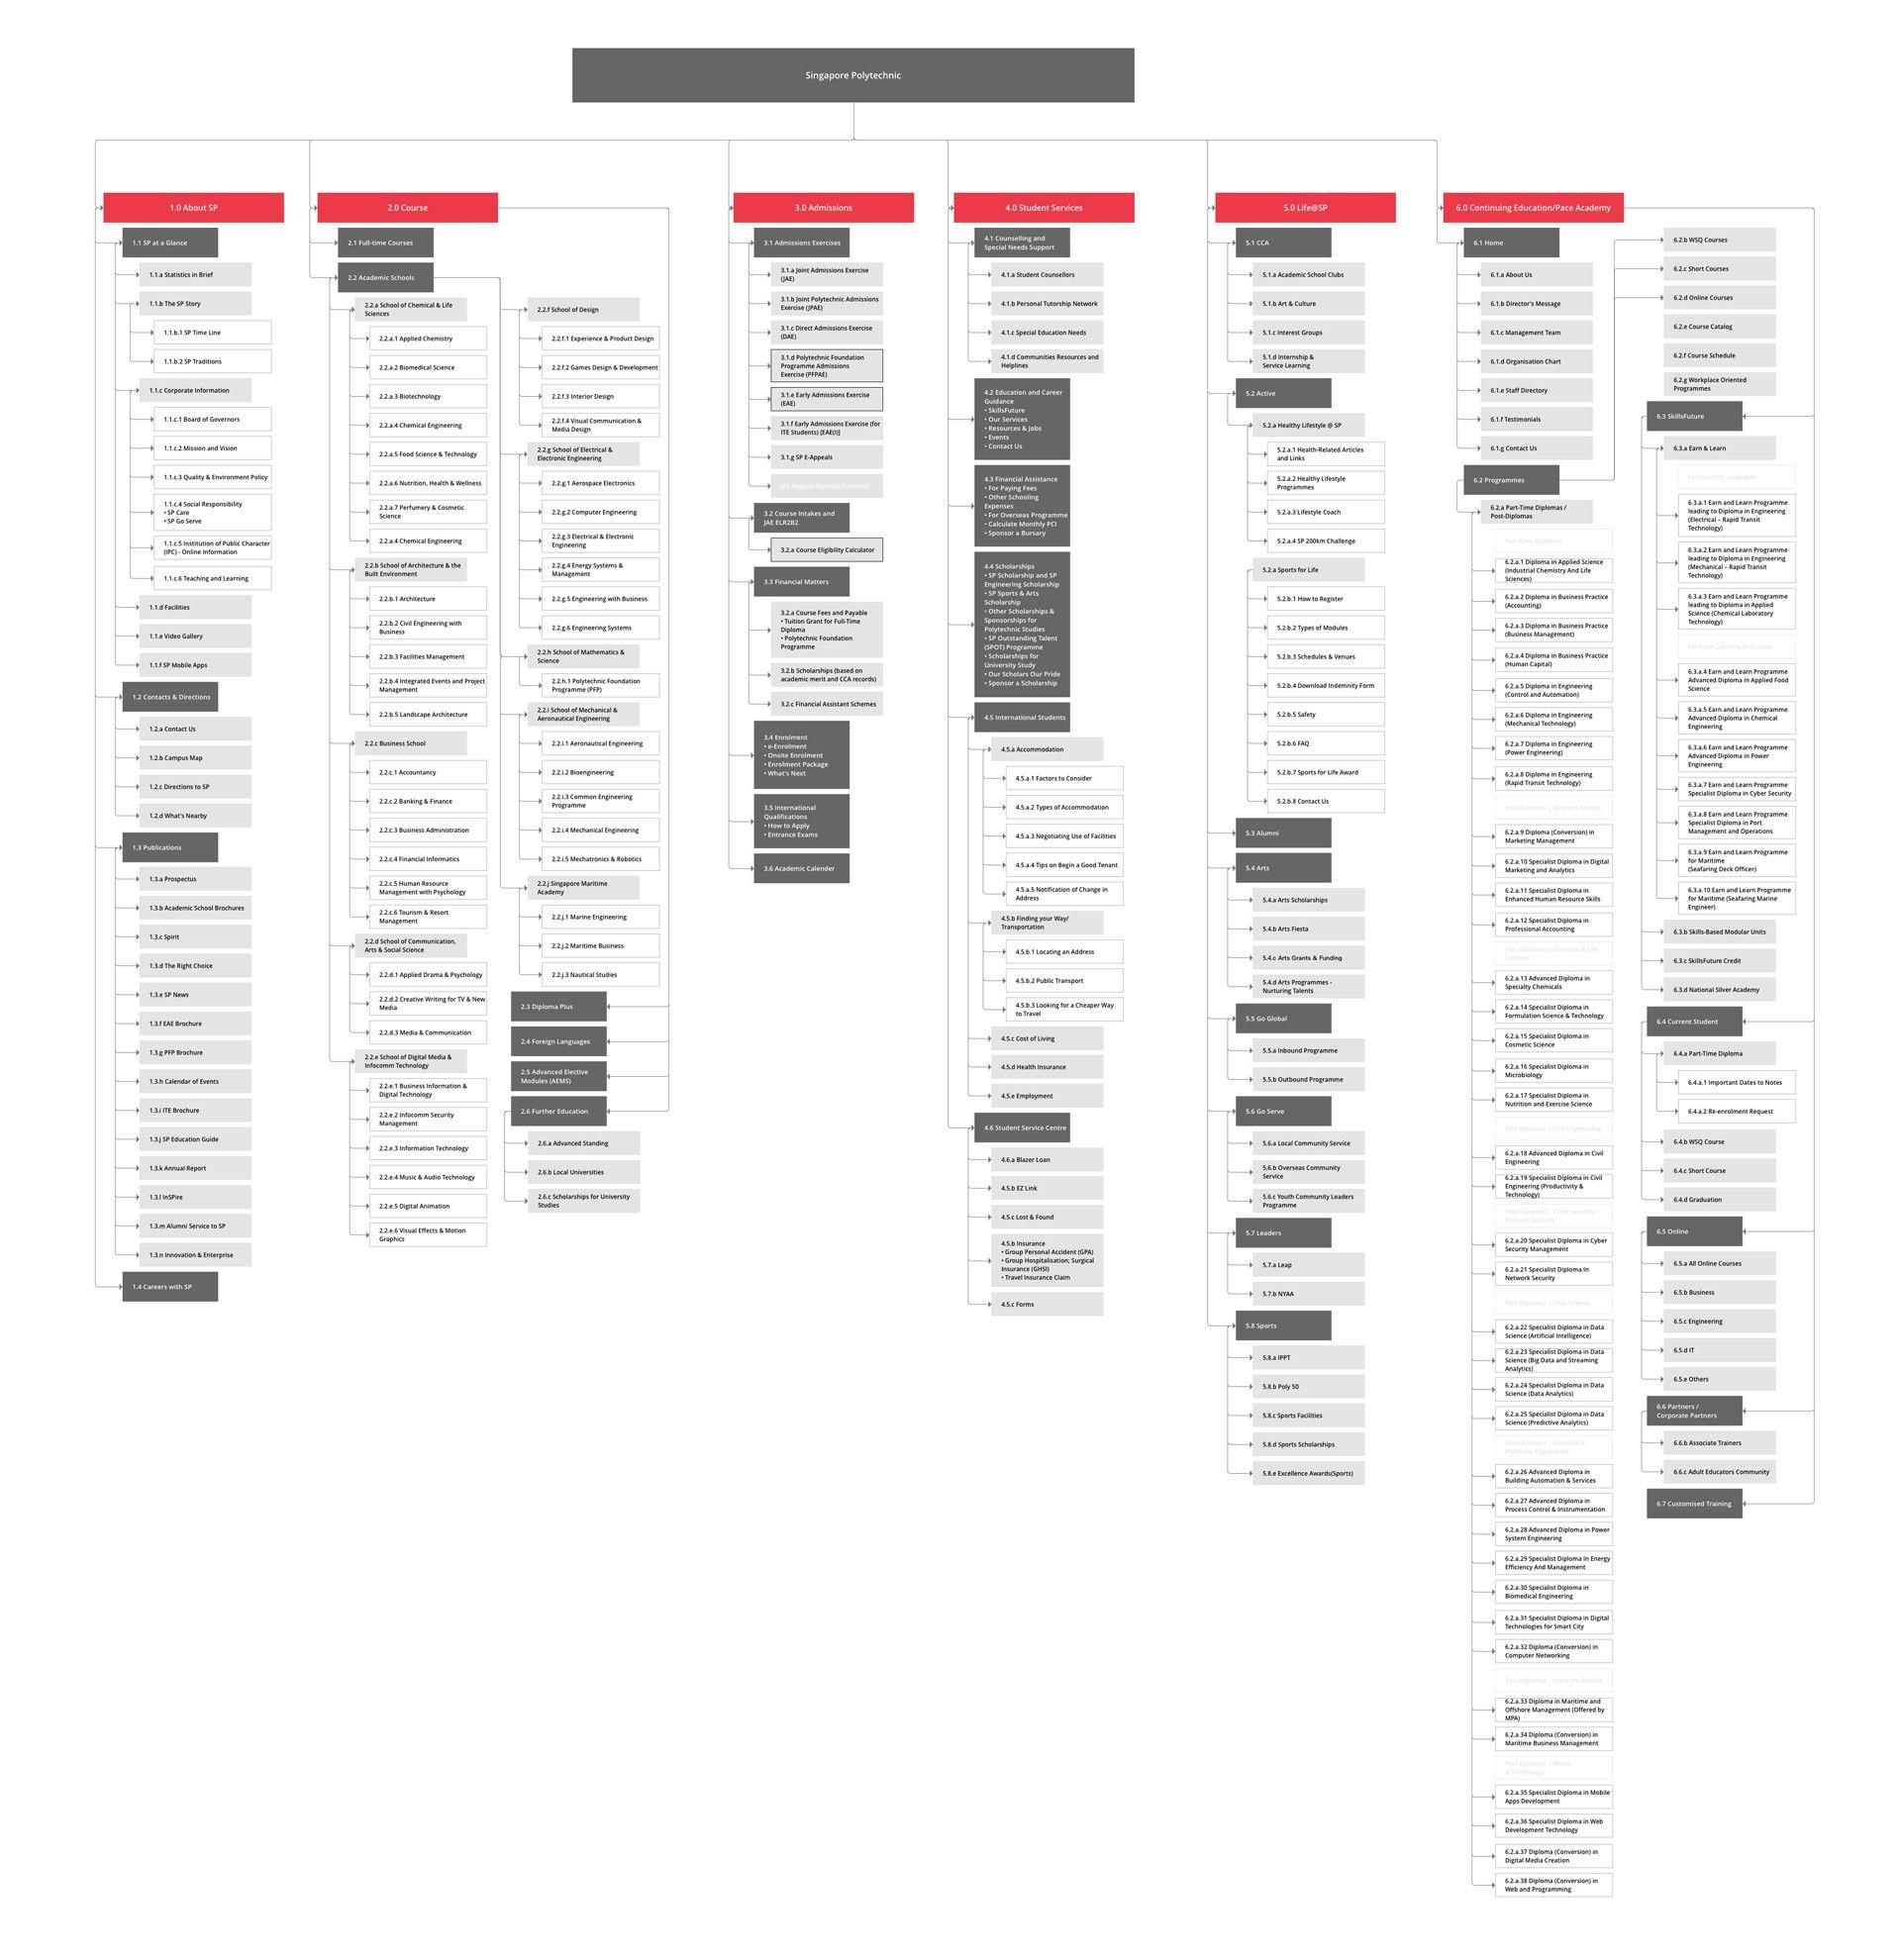 UX Case Study: Singapore Polytechnic Website Information